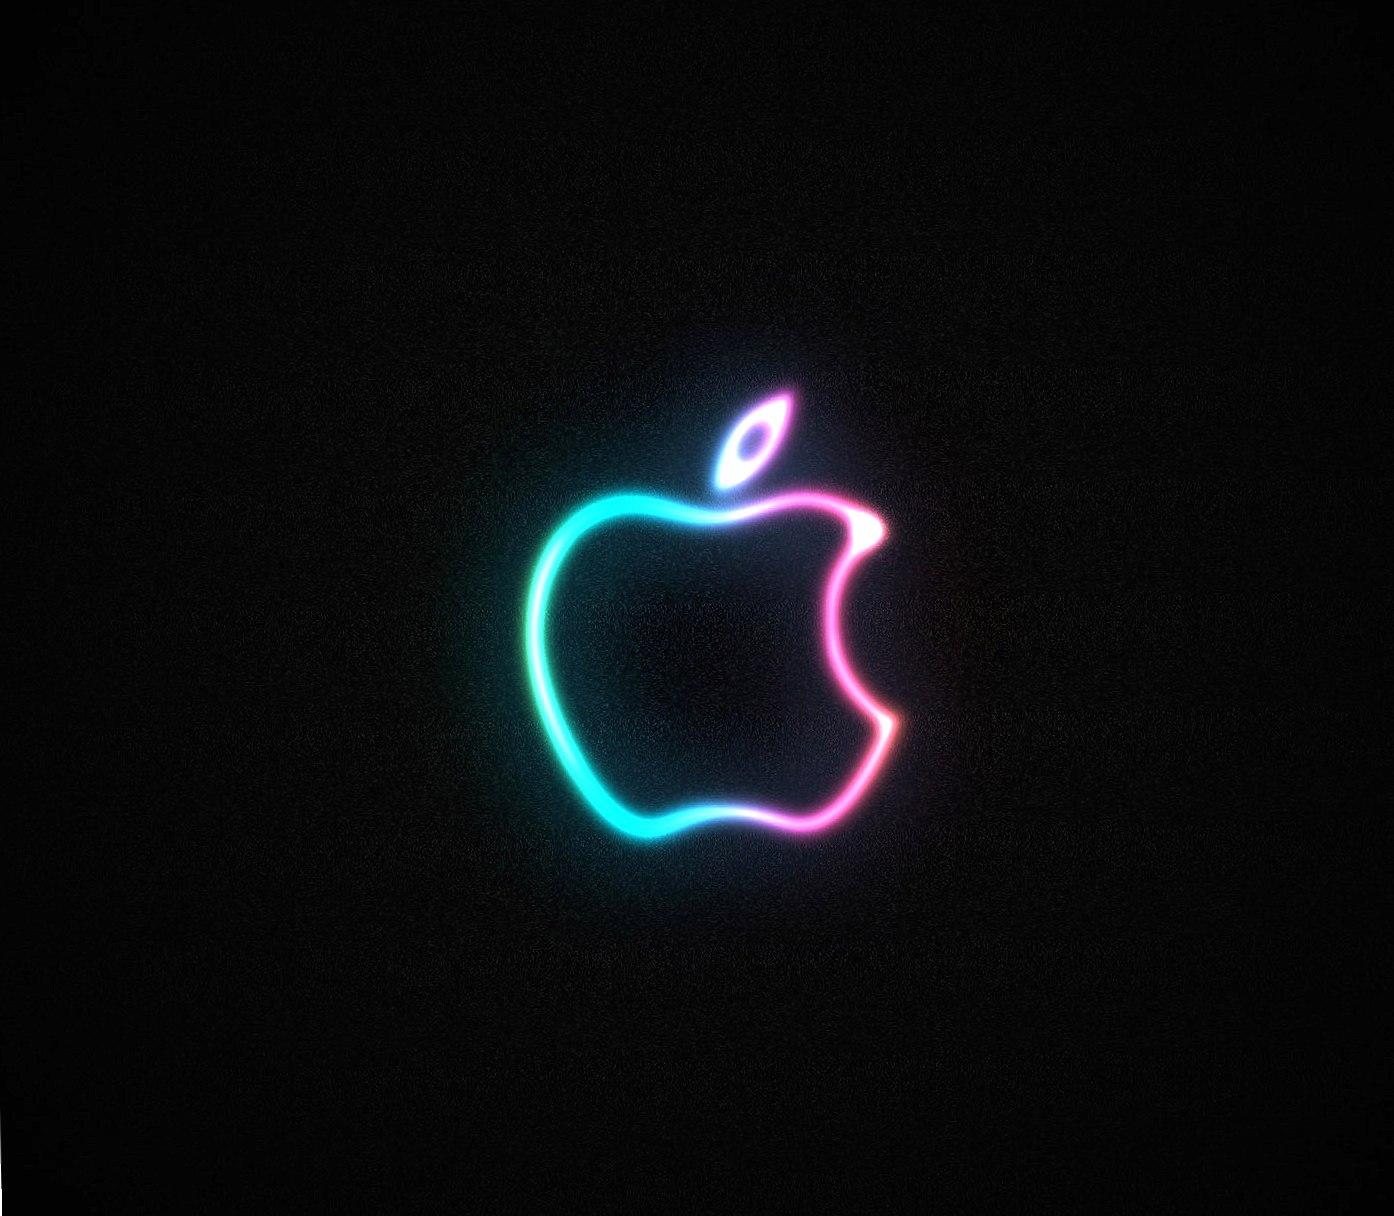 neon apple logo wallpapers HD quality